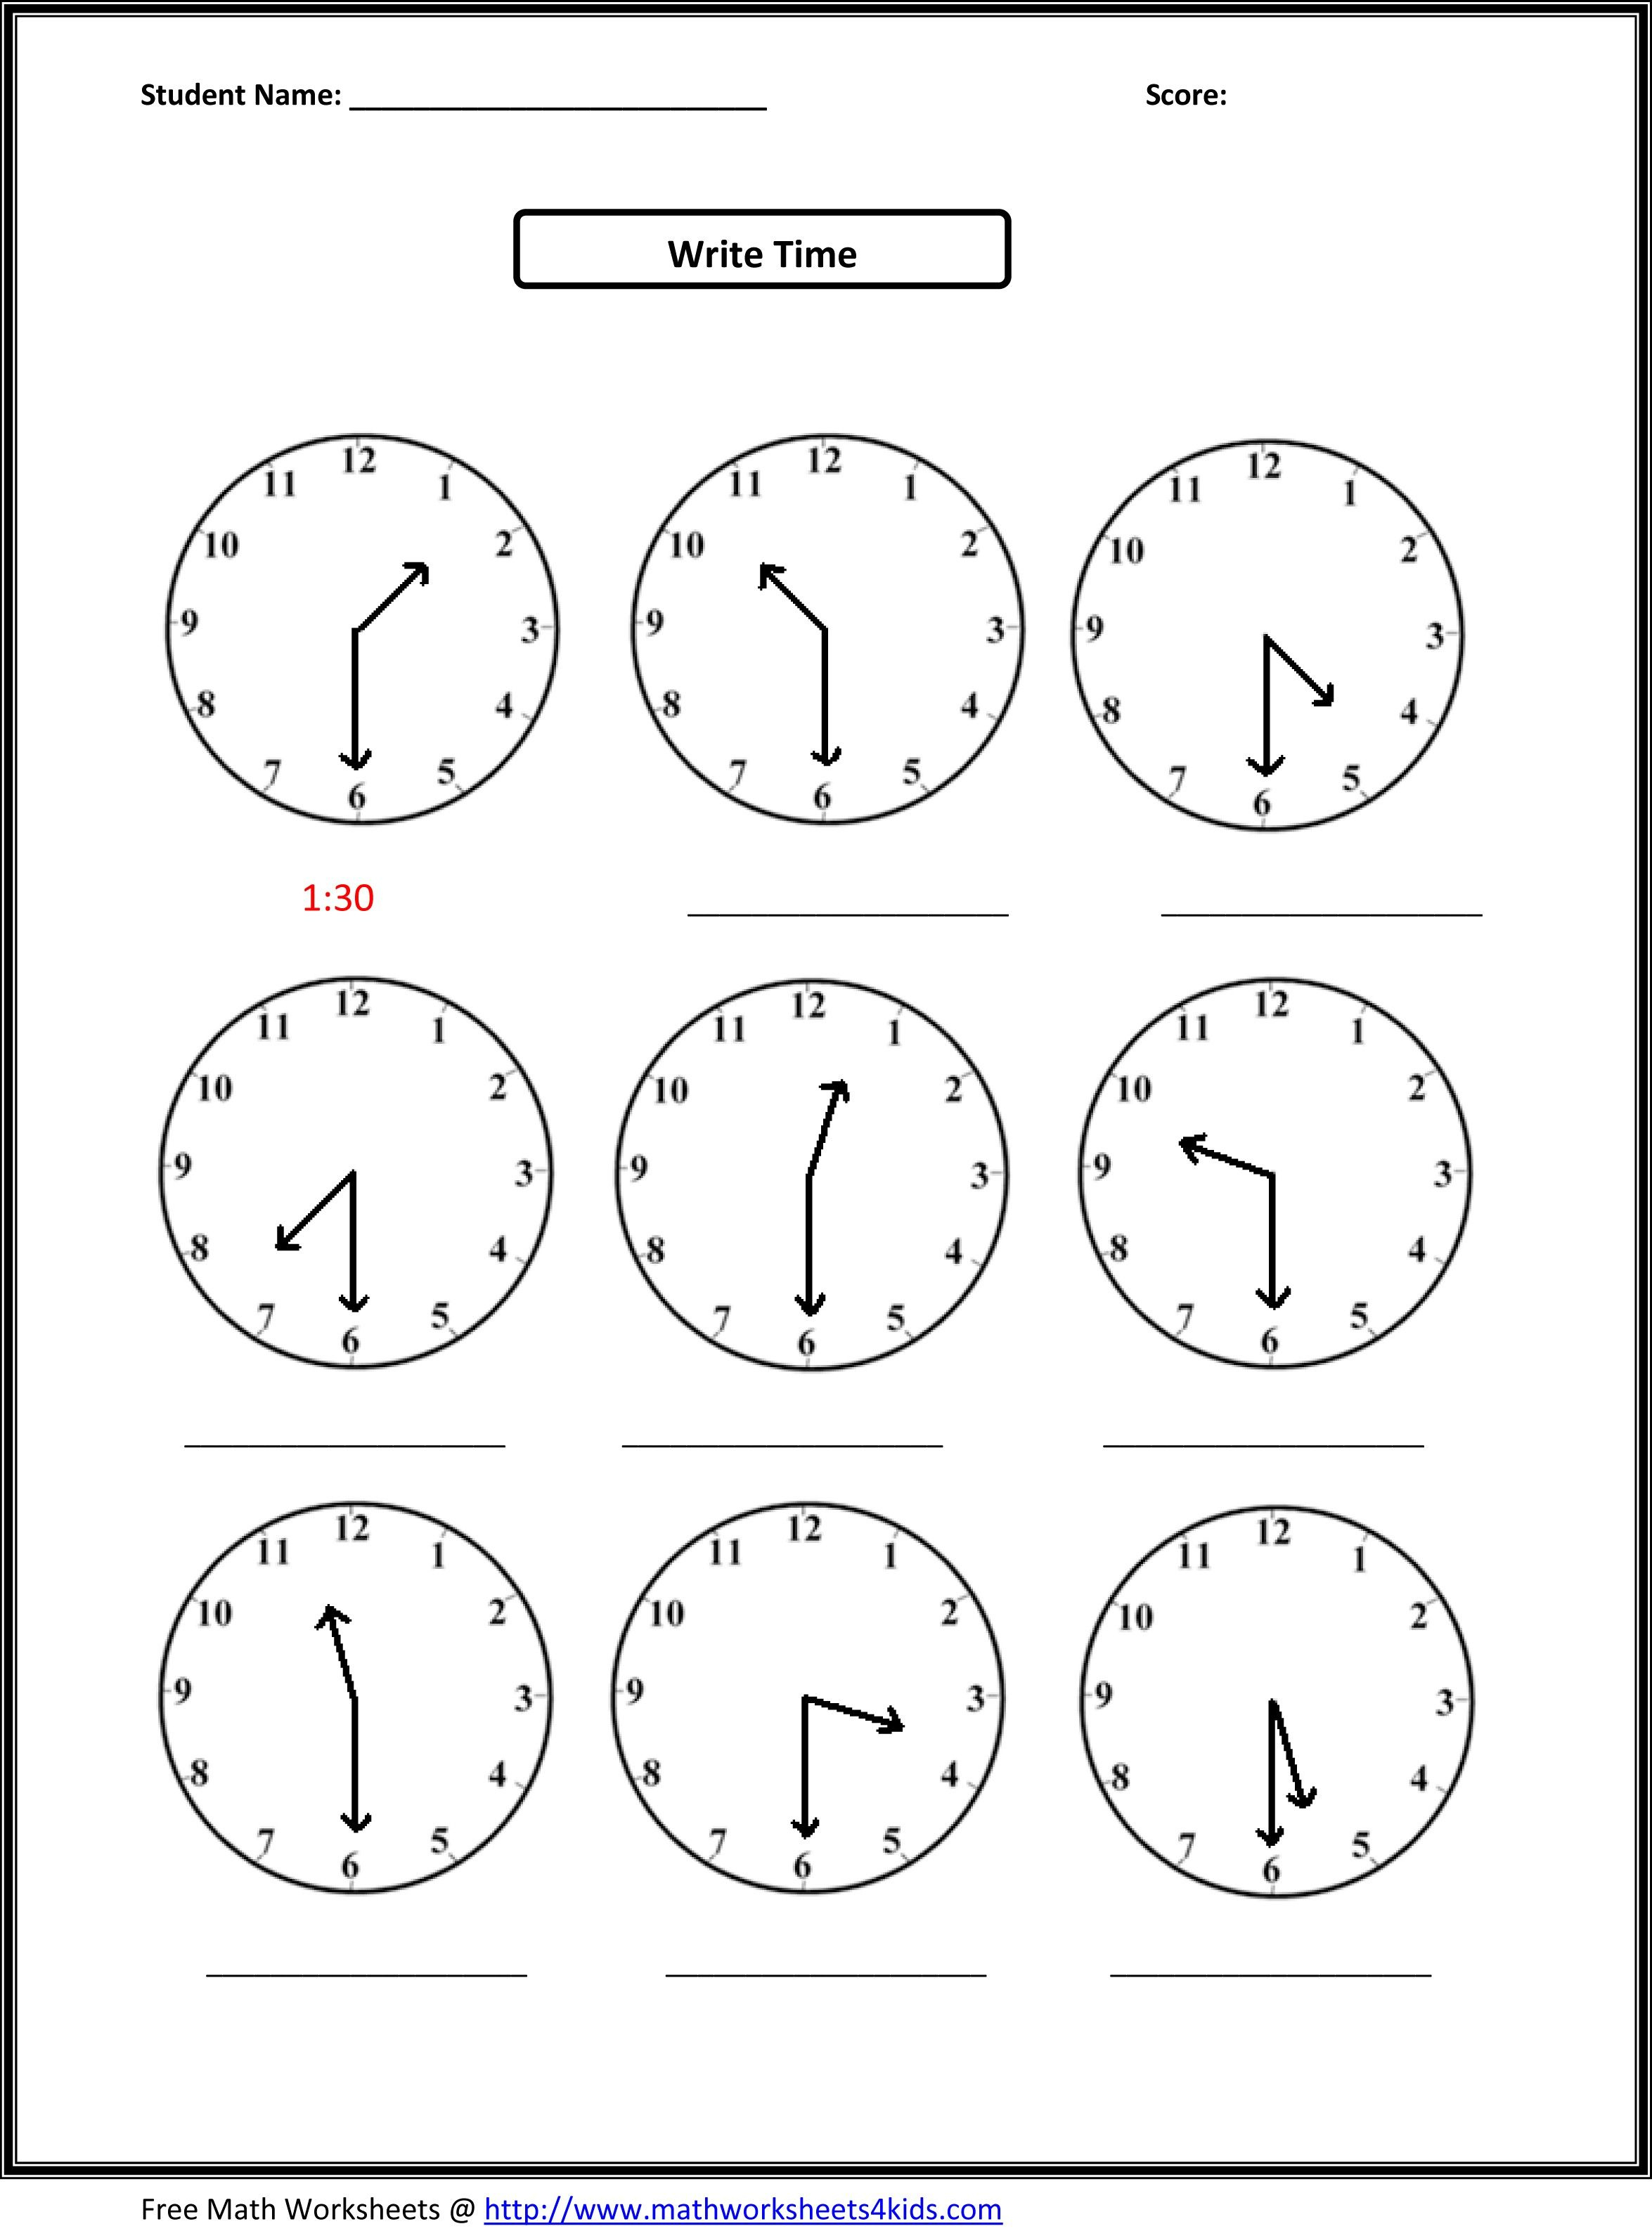 2Nd Grade Free Worksheets Math   Math: Time/measurement   2Nd Grade   Free Printable Second Grade Math Worksheets